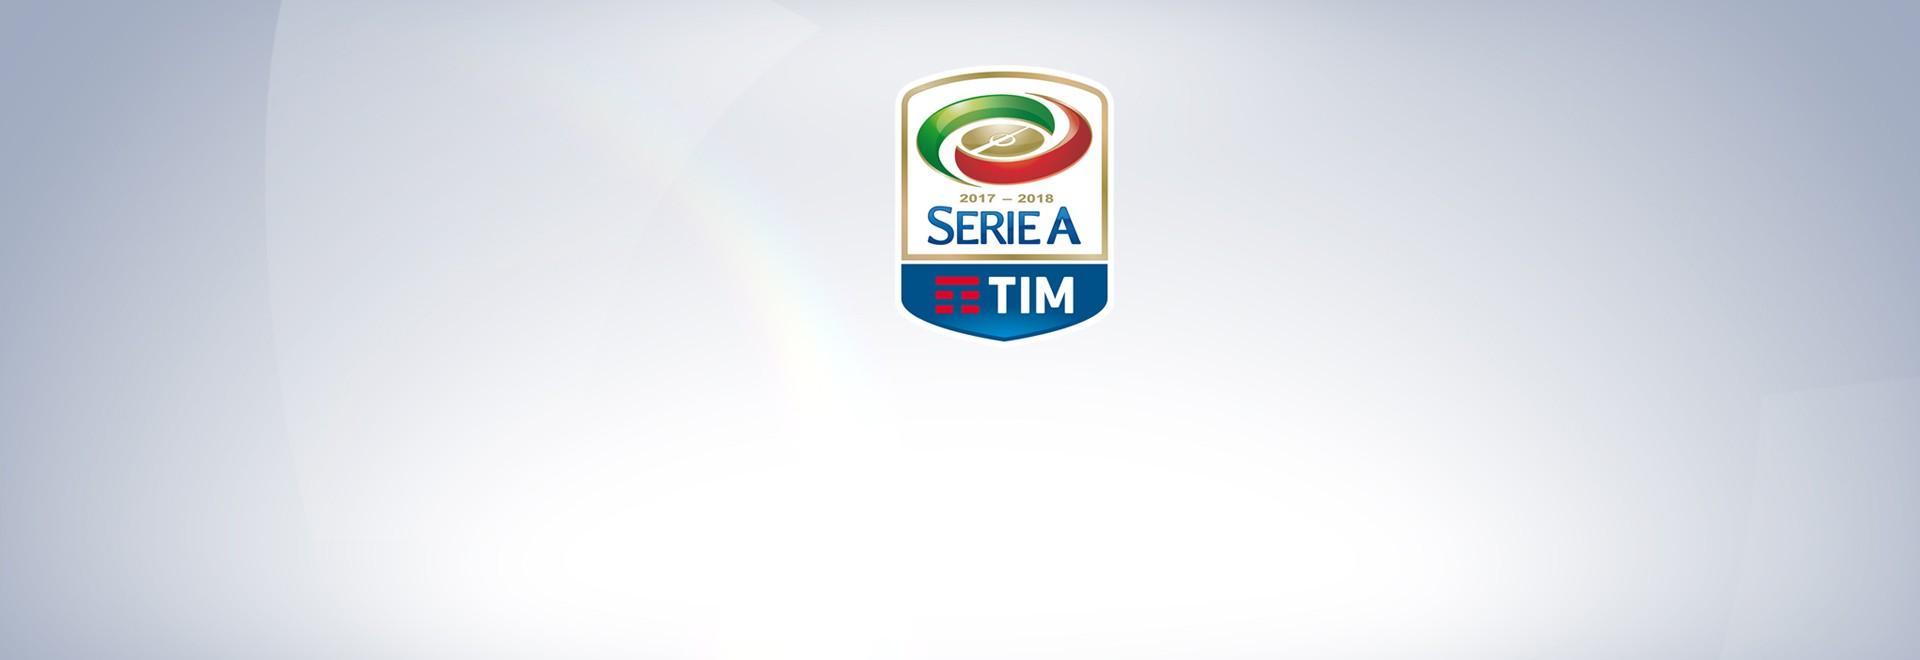 Roma - Sassuolo